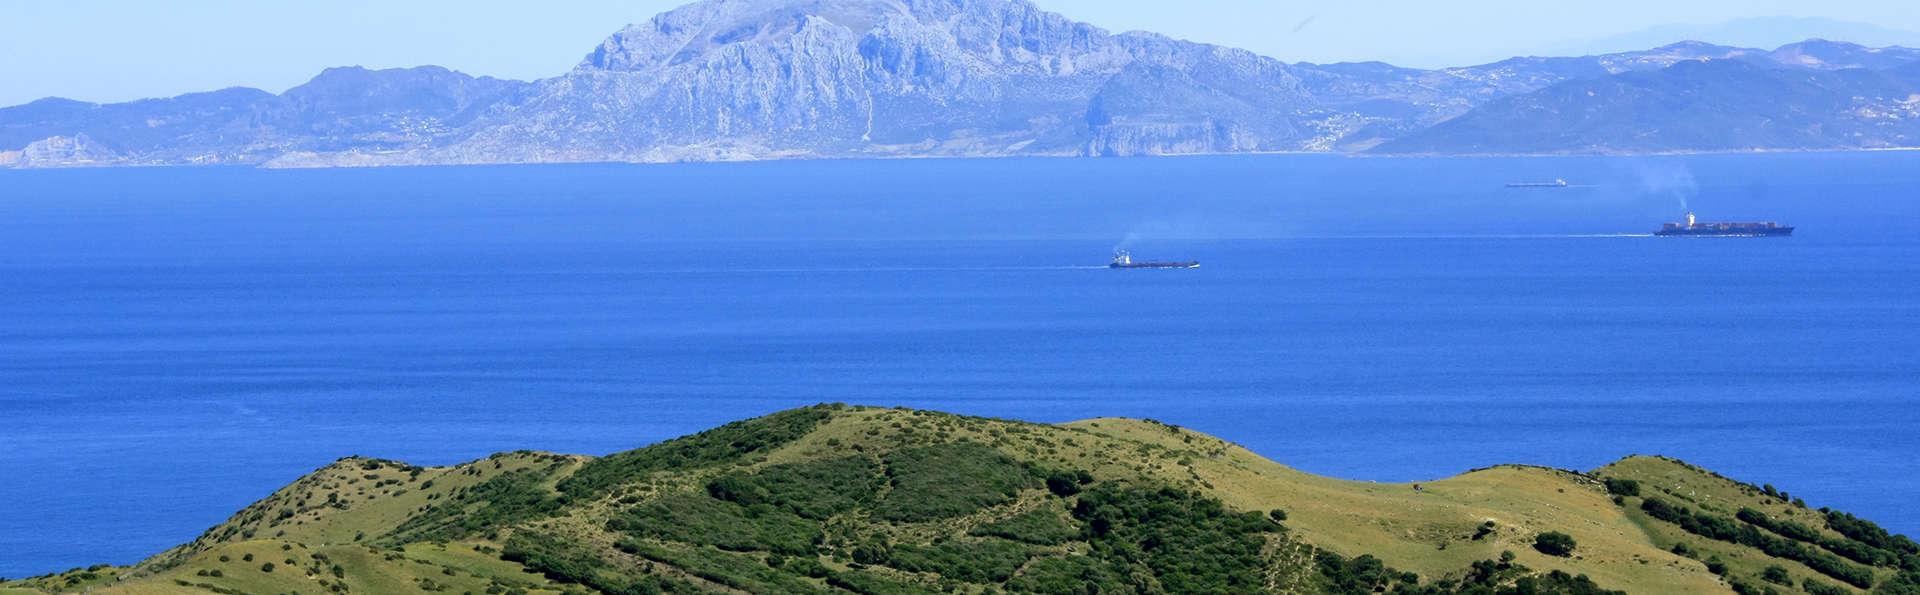 Hotel Alborán Algeciras - EDIT_NEW_Algeciras2.jpg